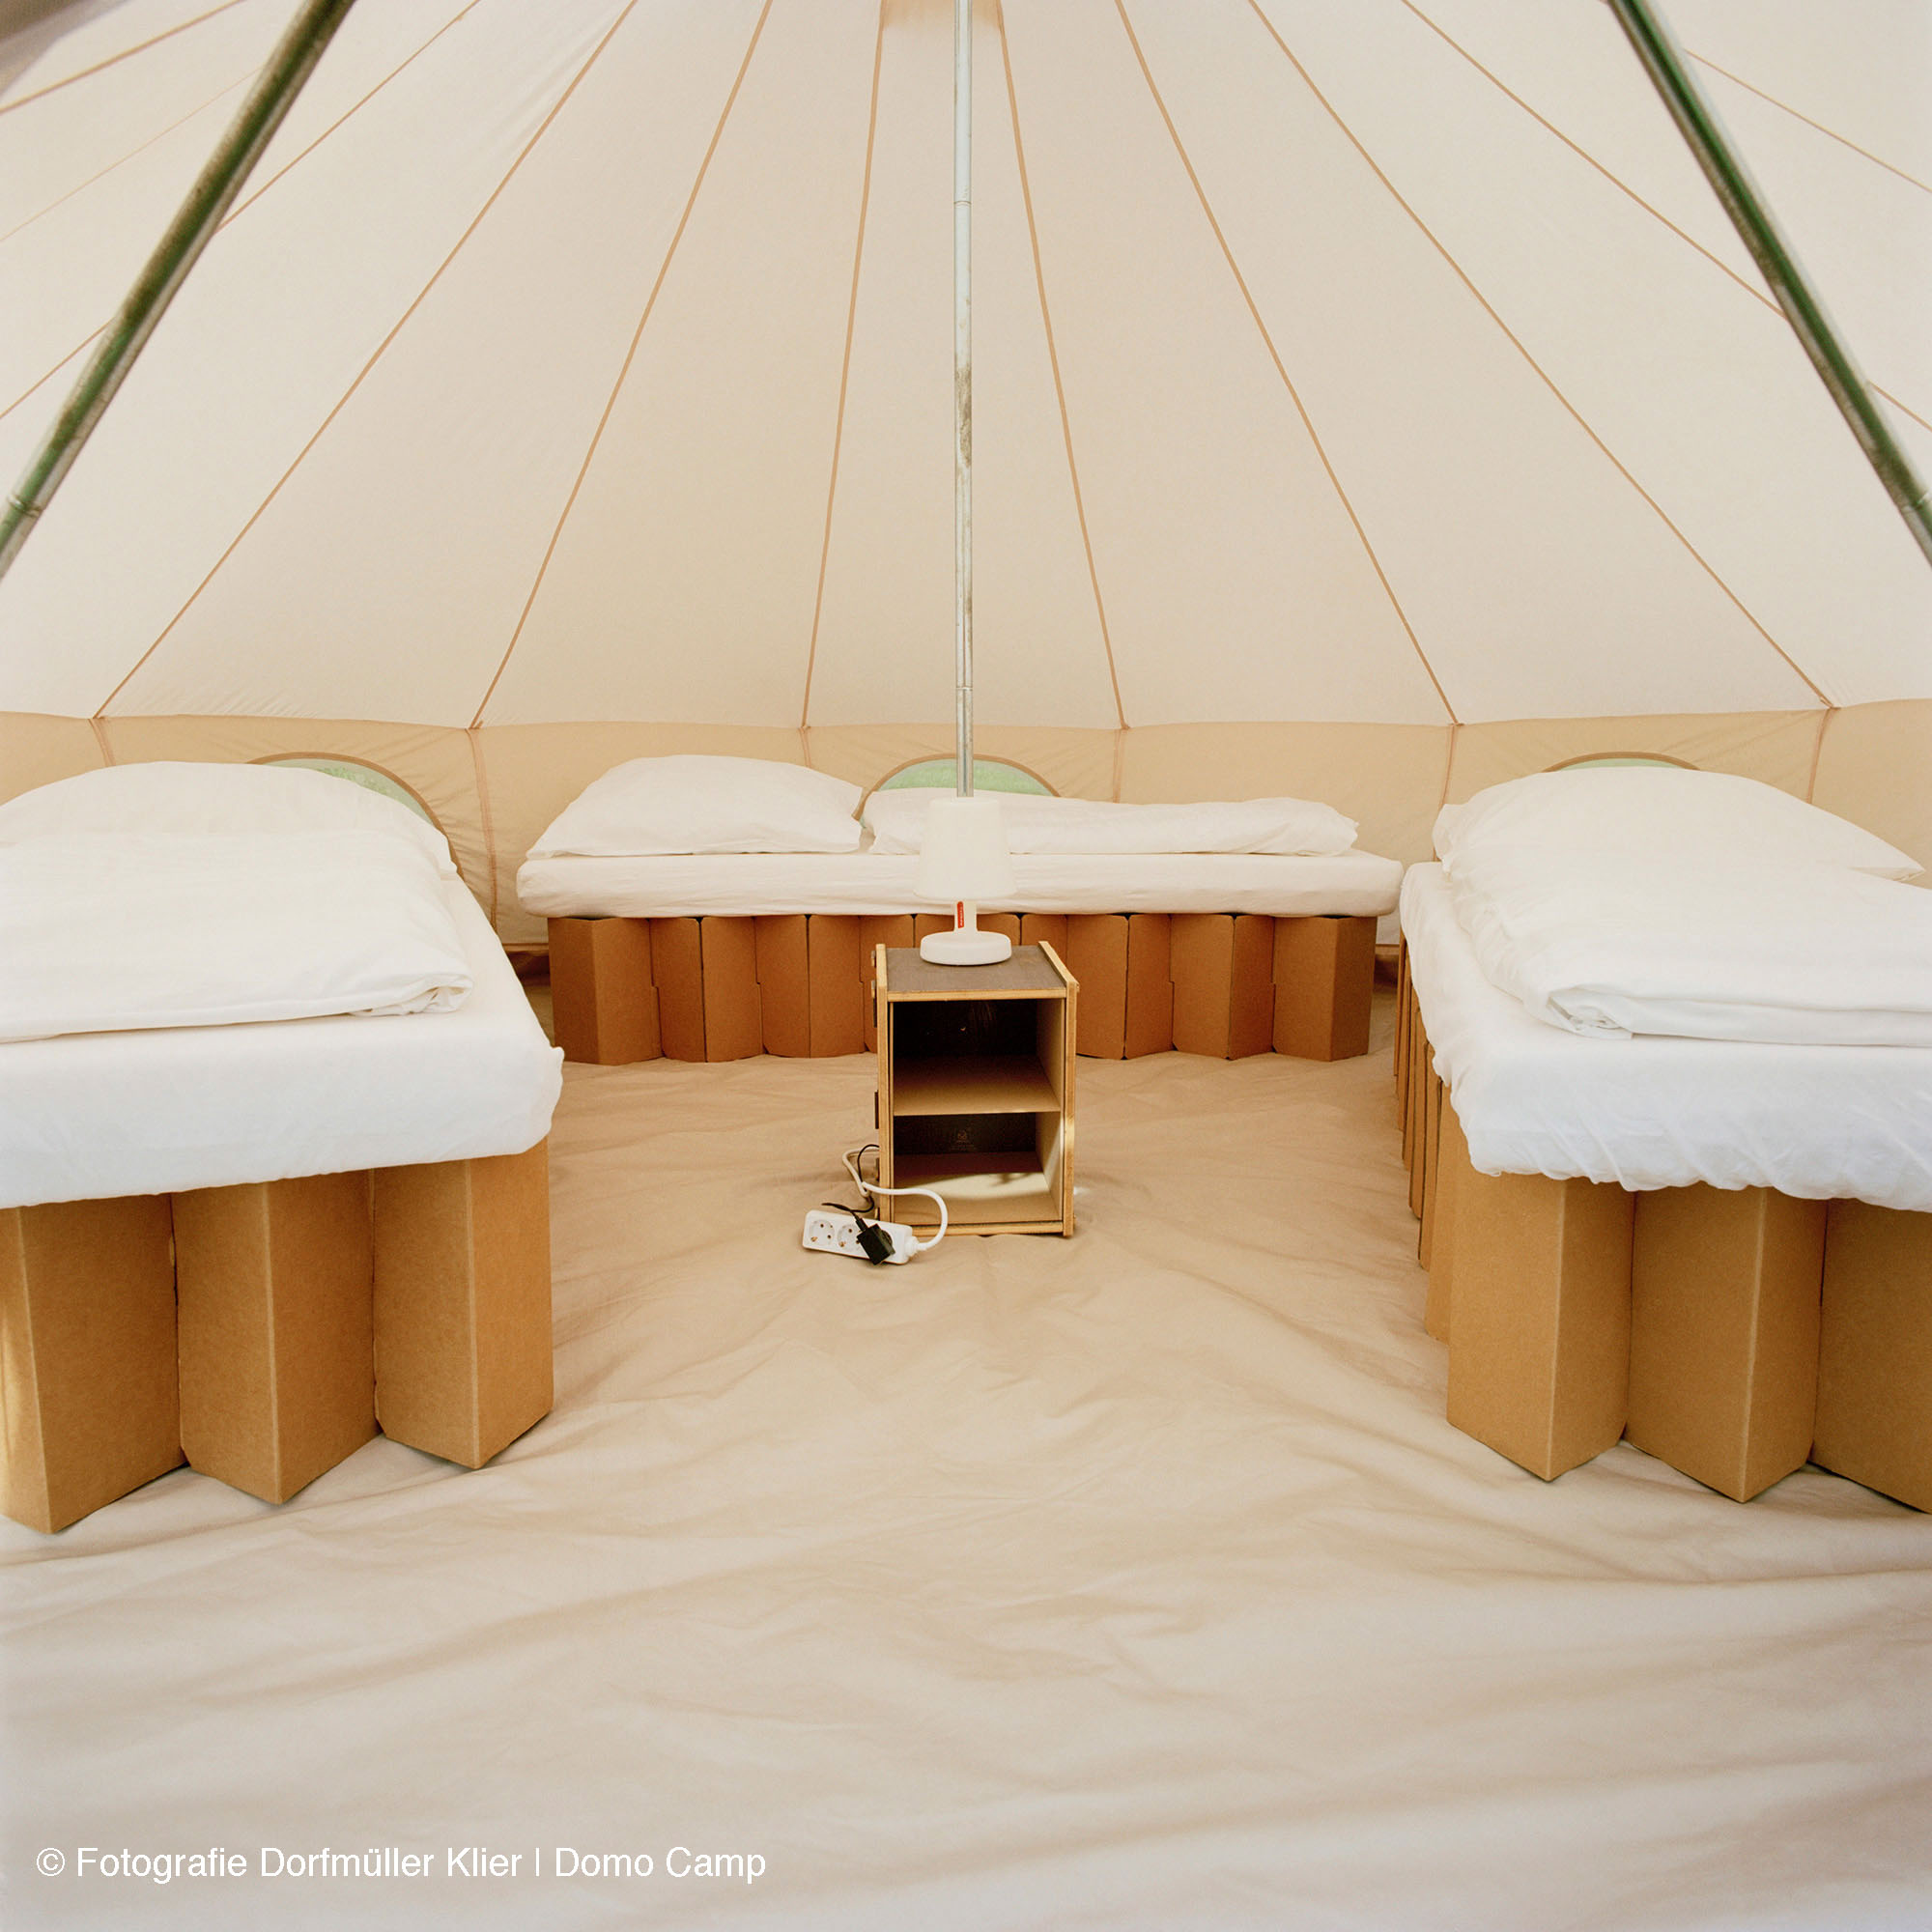 Domo Camp